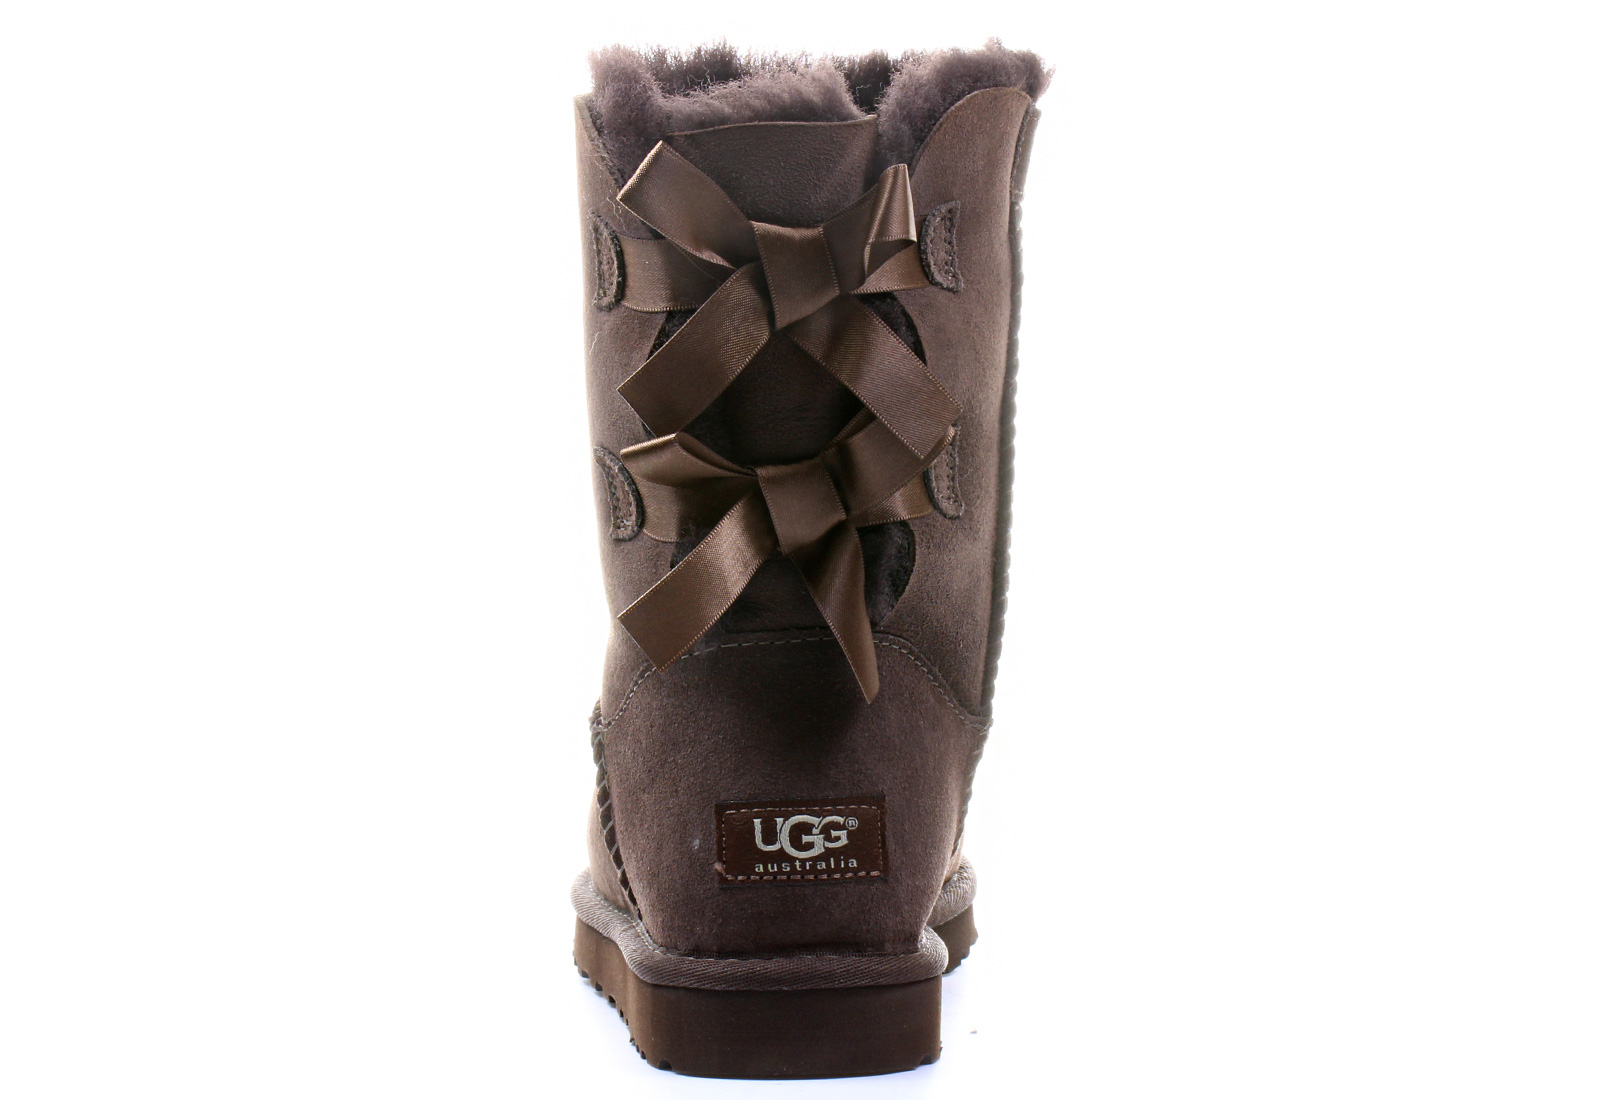 2c233eda15d UGG Bailey Bow 1002954 Grey Boots - cheap watches mgc-gas.com